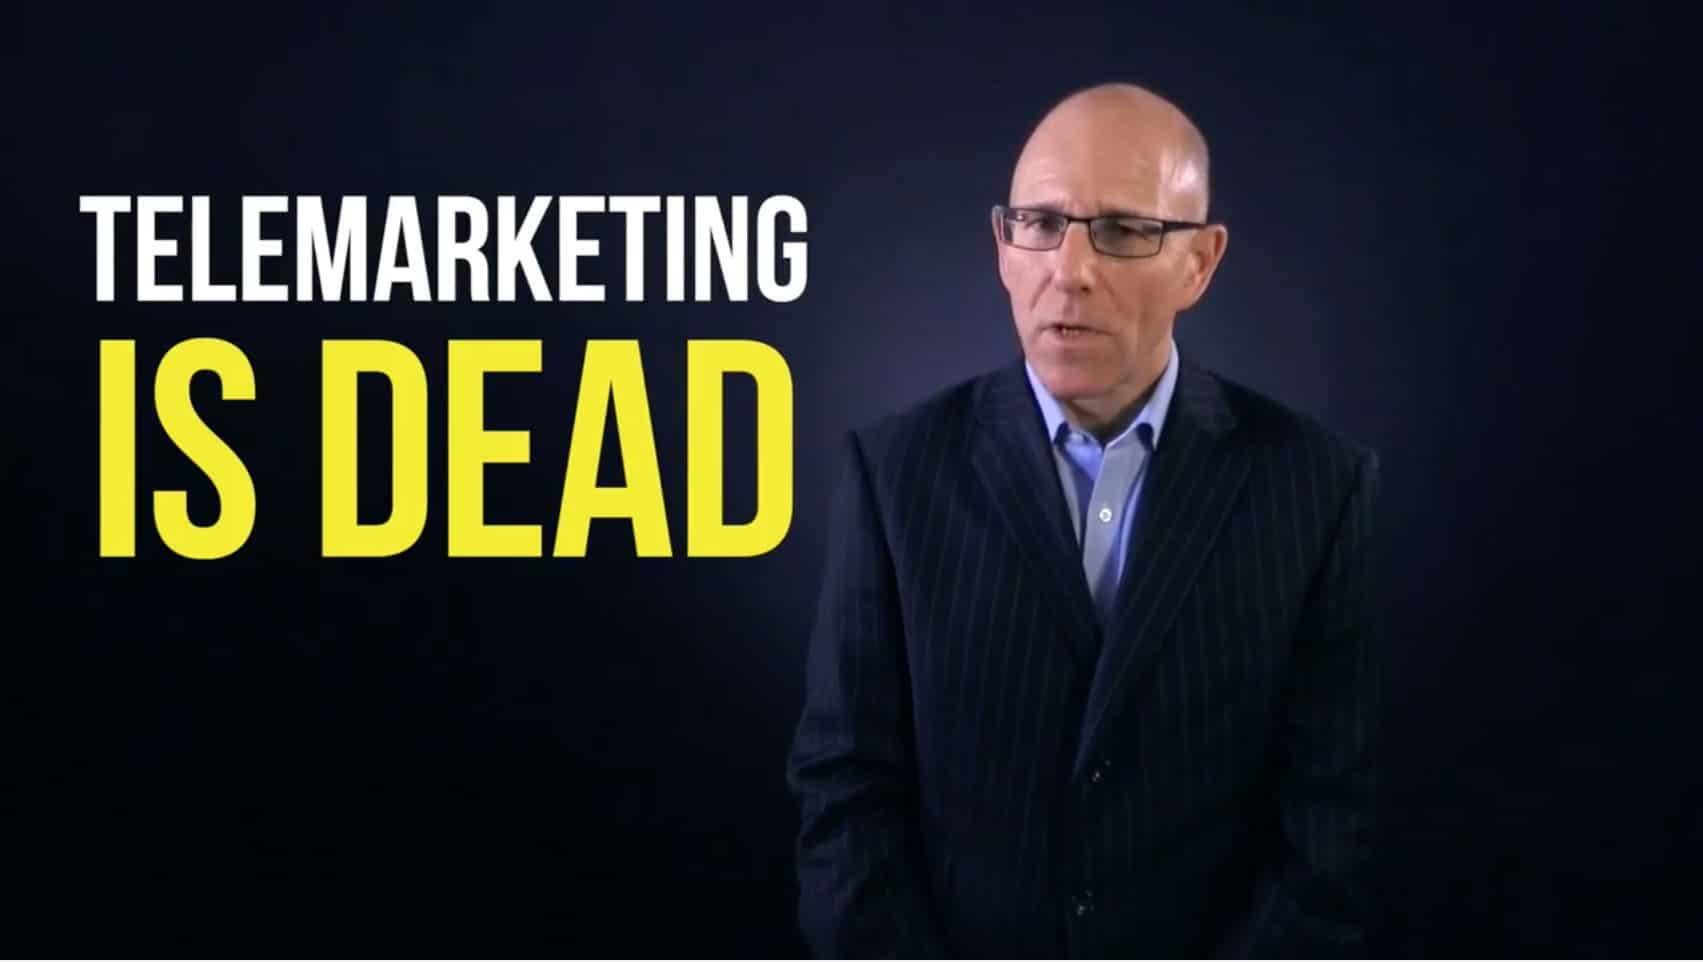 telemarketing is dead